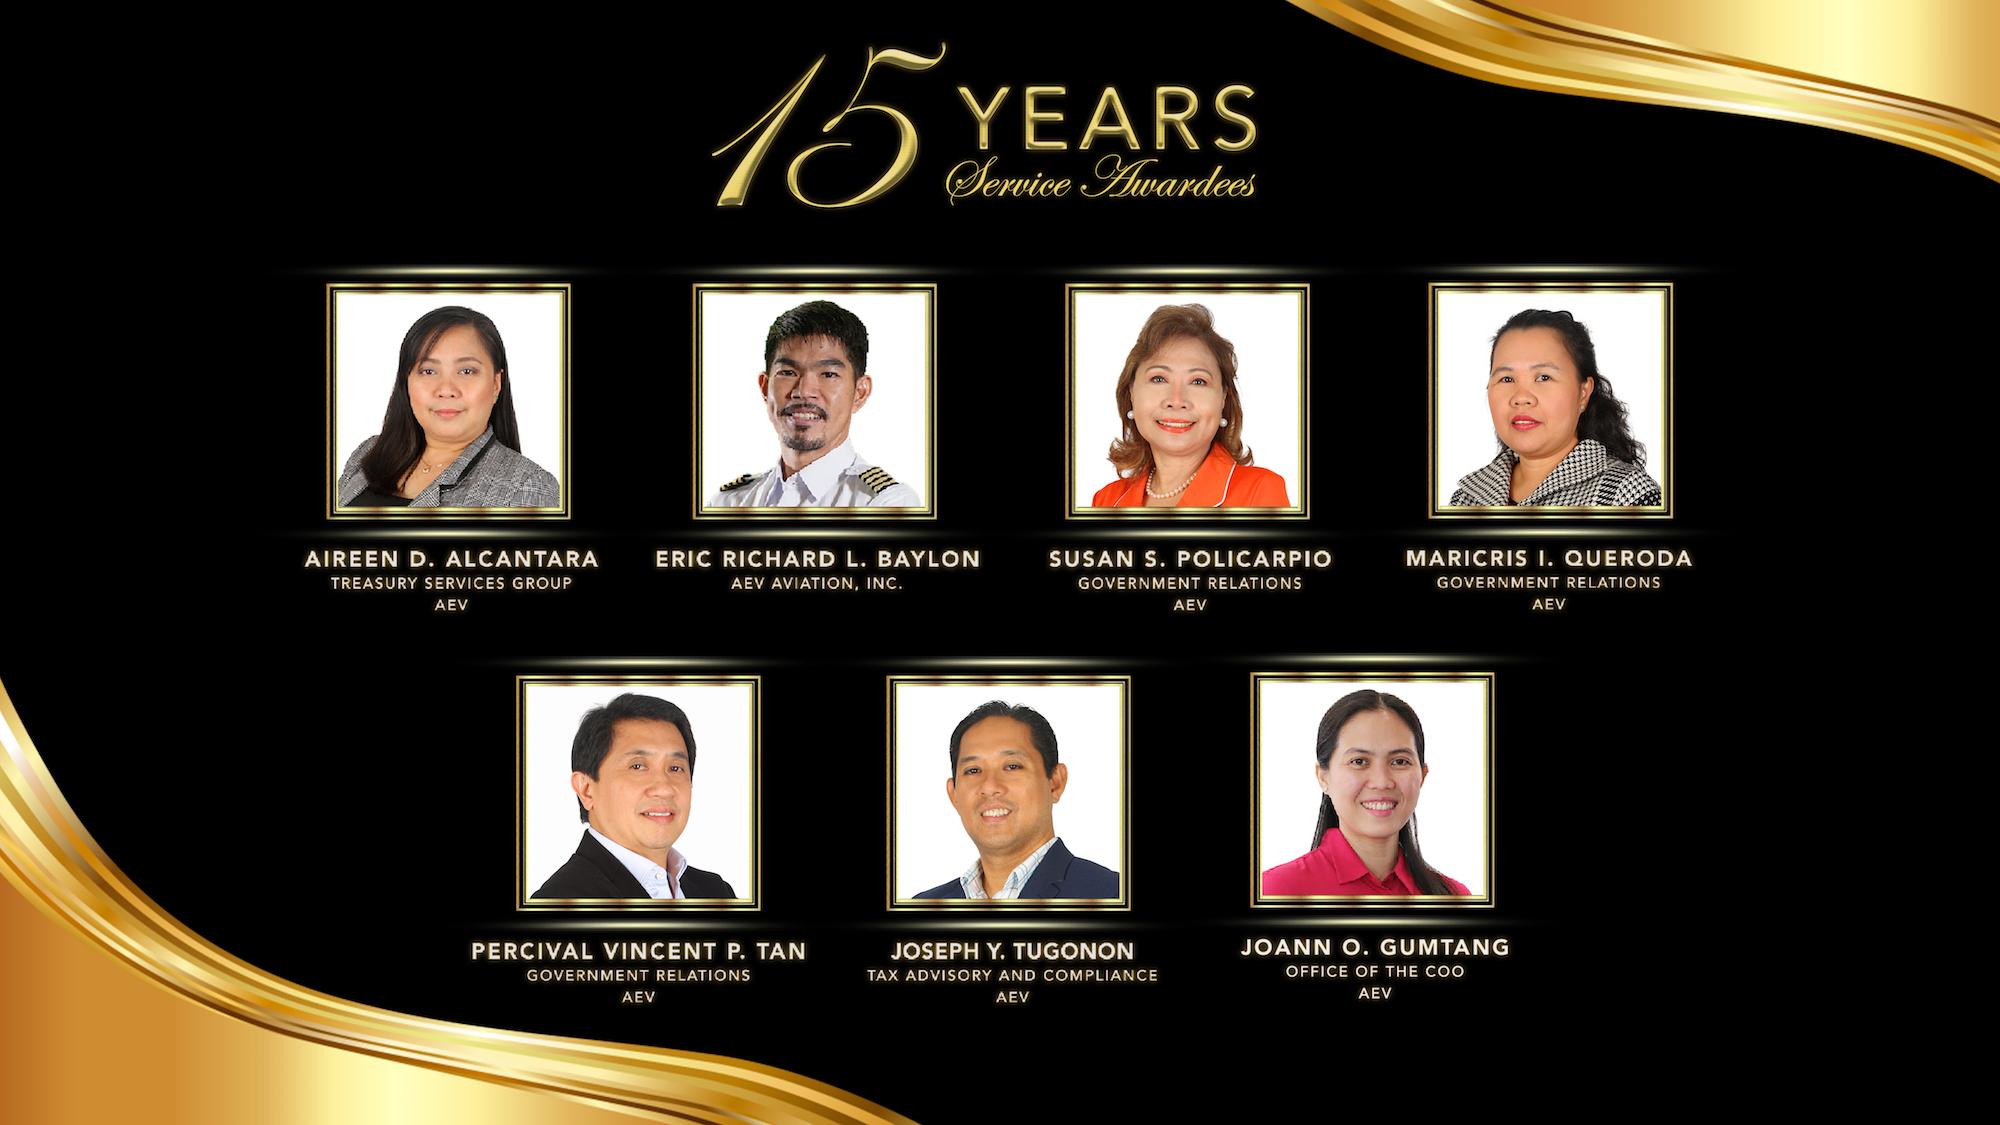 EIA Deck 15 years awardee